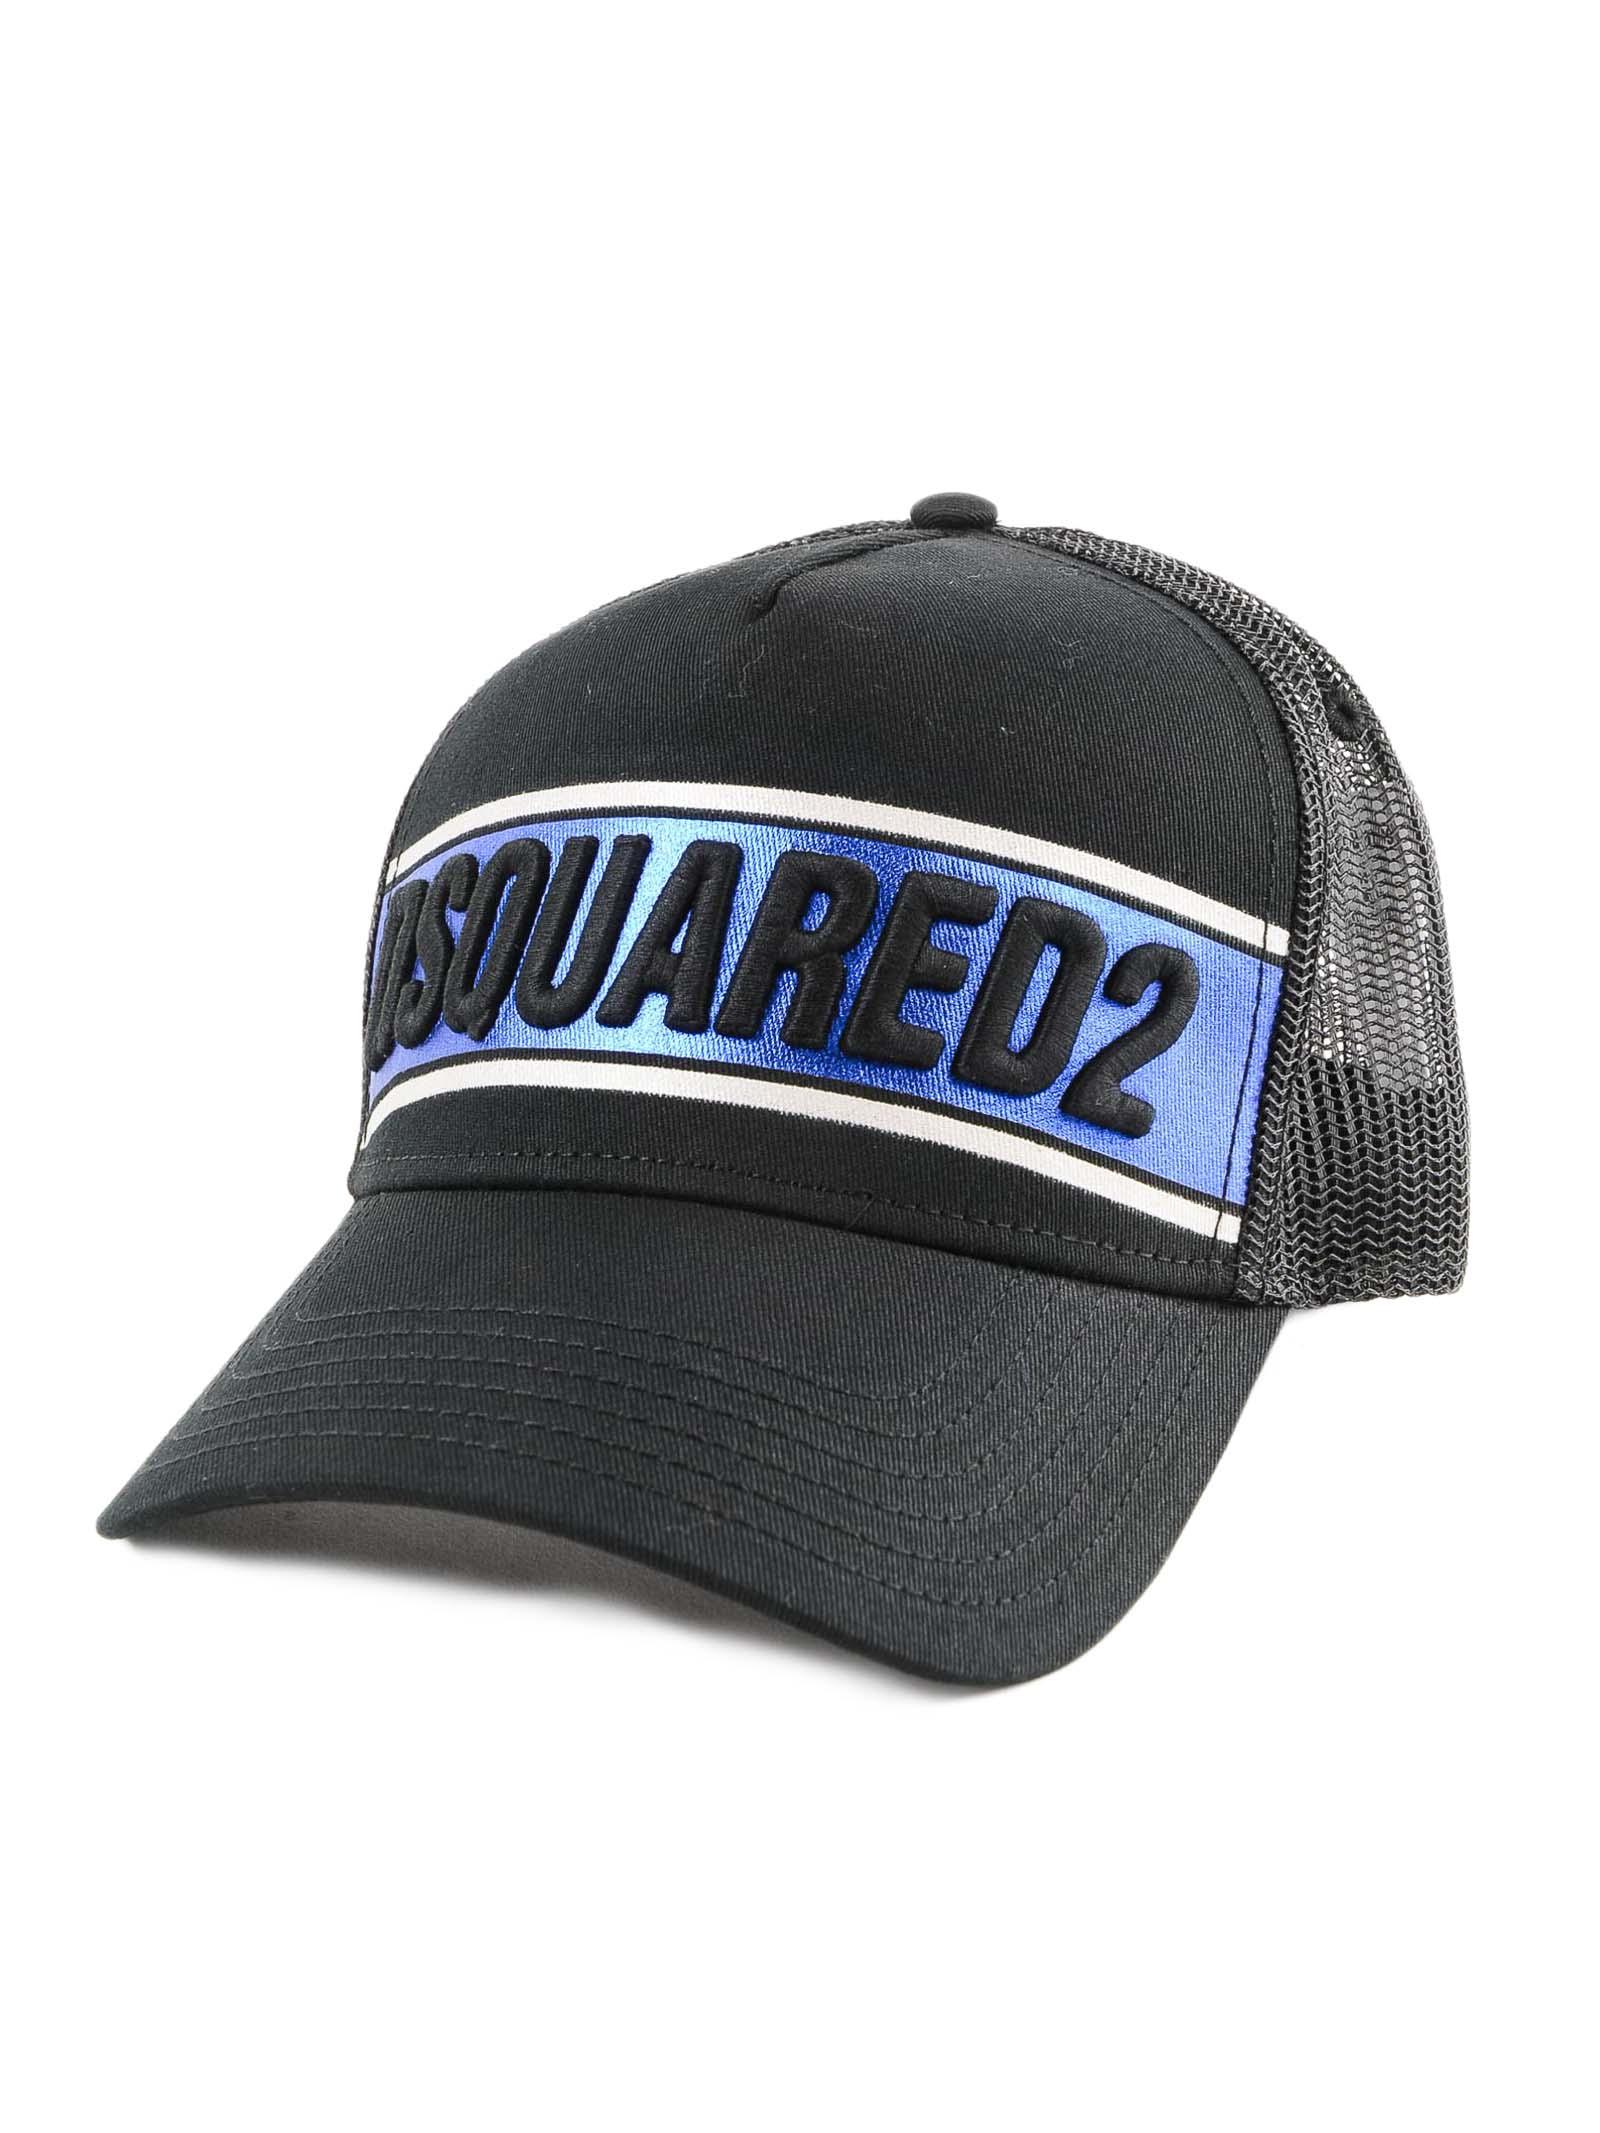 Dsquared X The Best Shops Baseball Cap